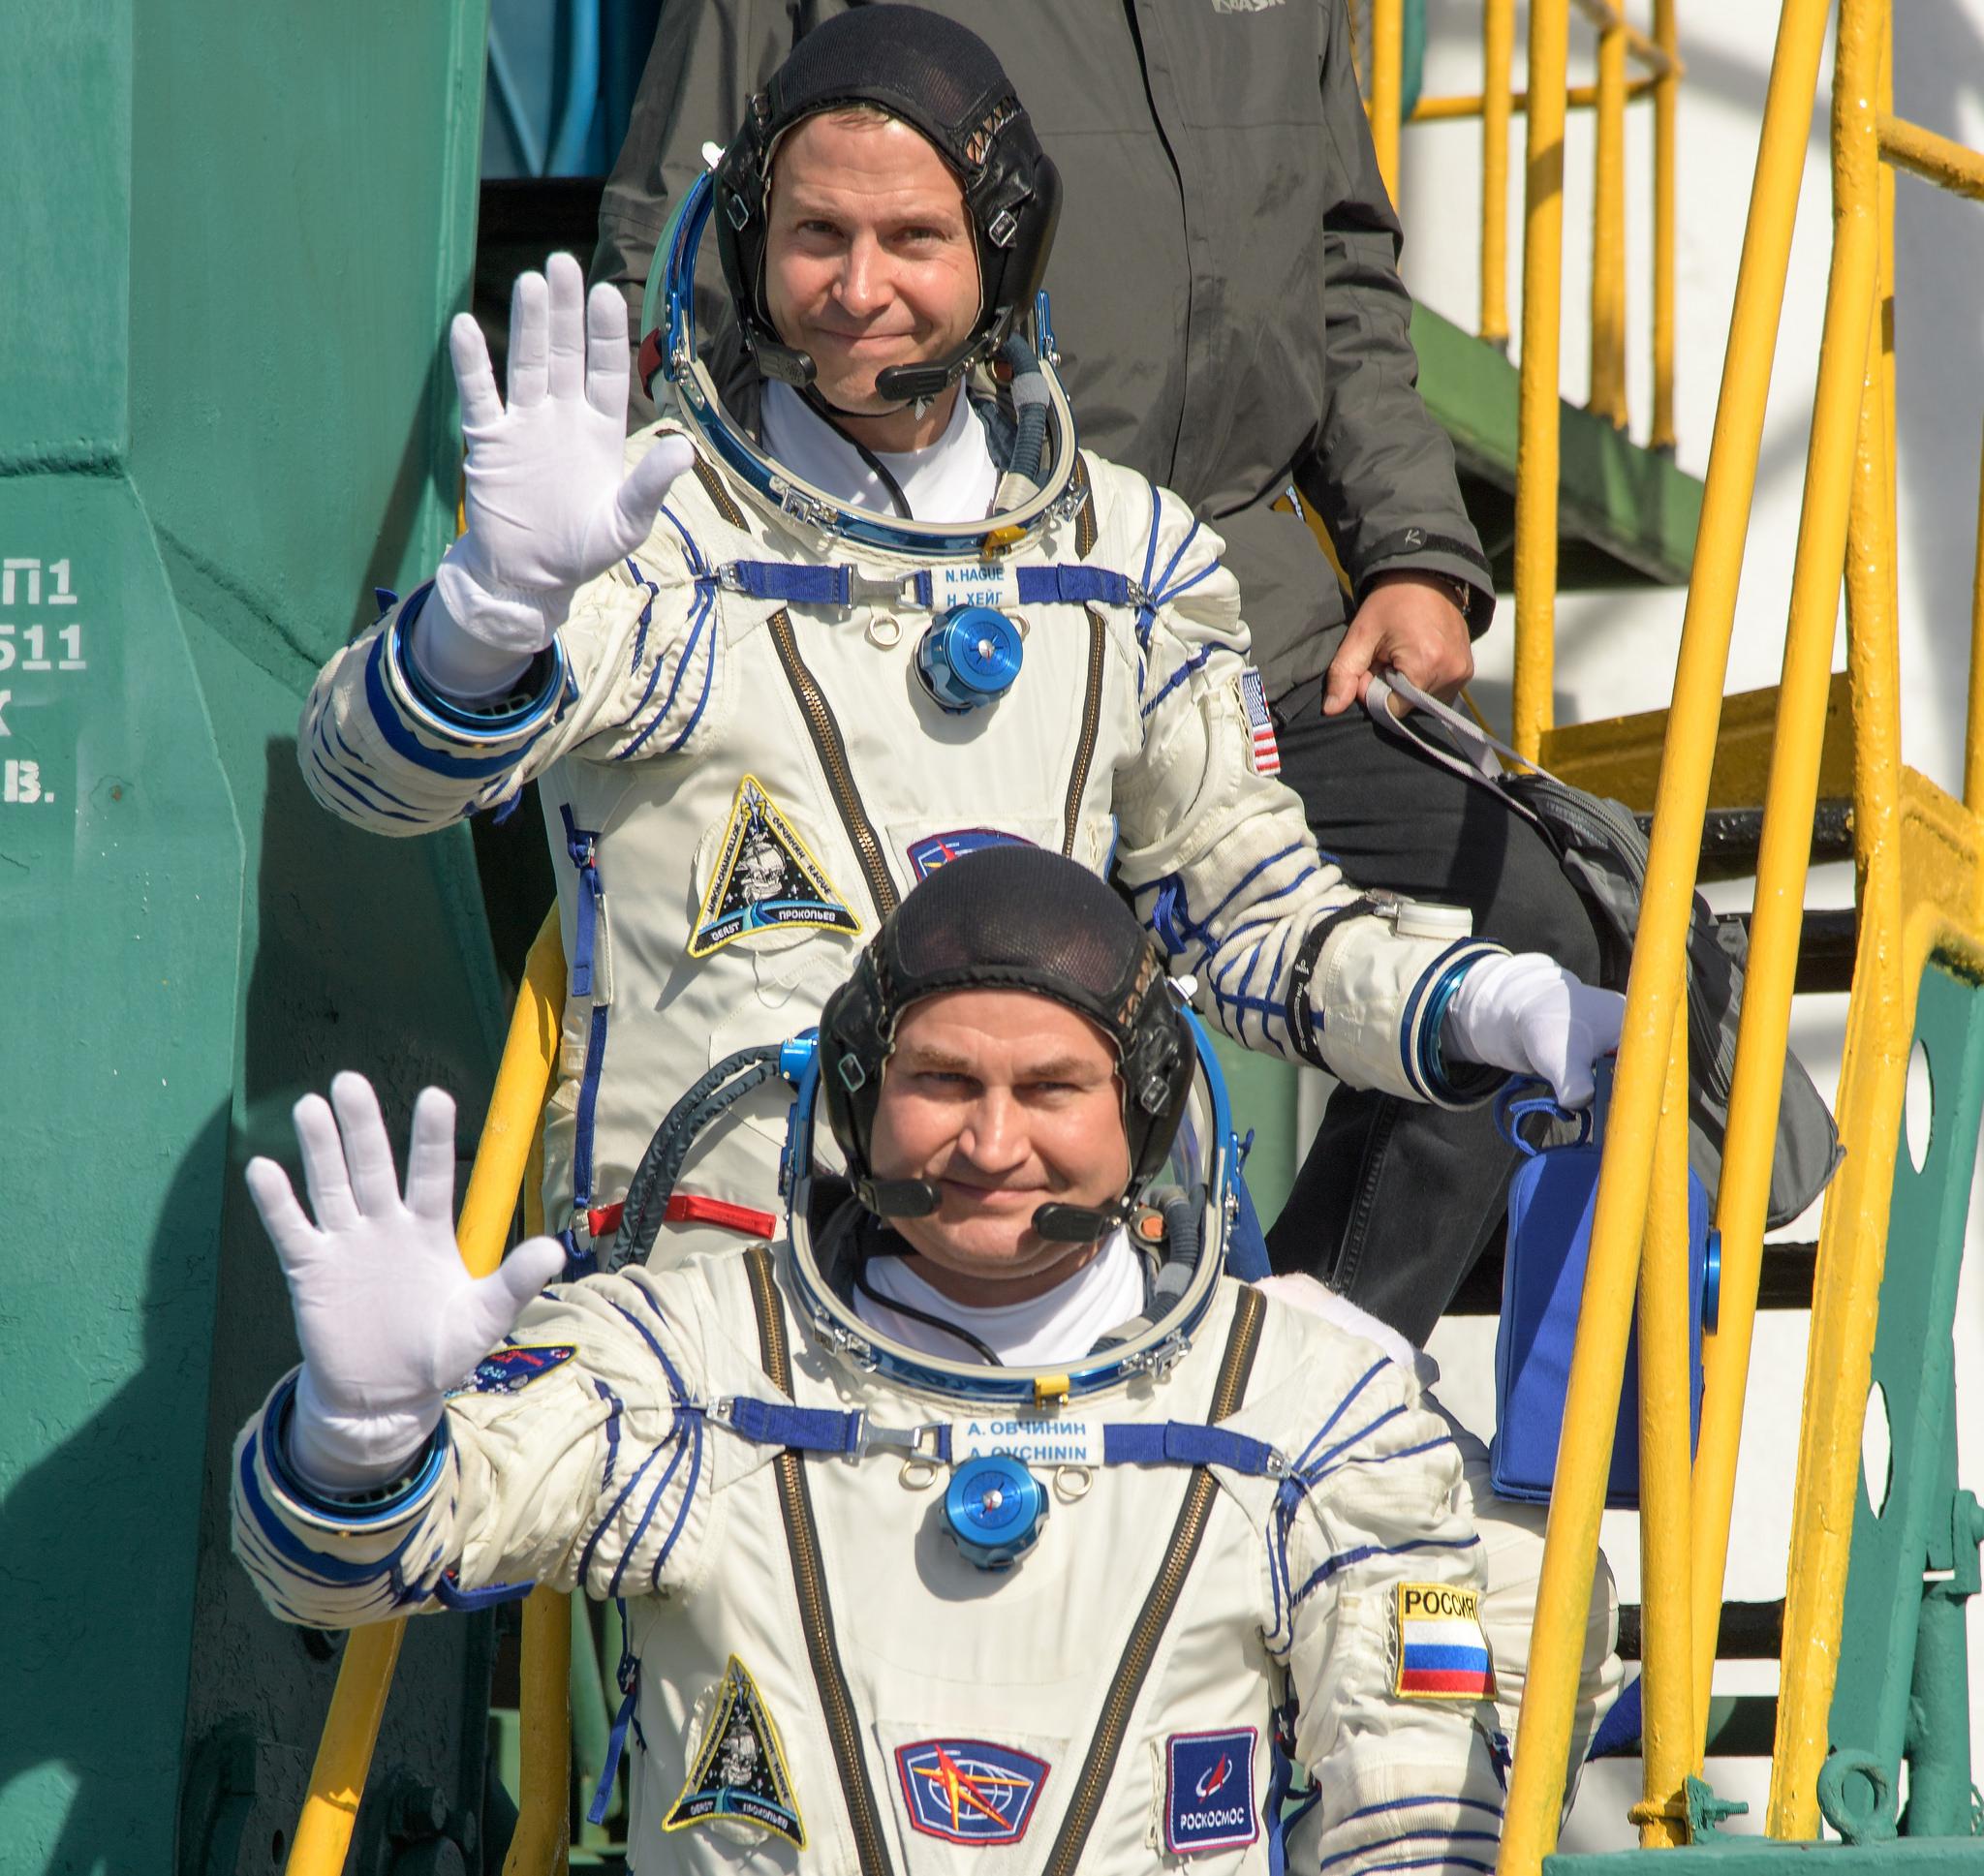 NASA astronaut Nick Hague, top, and Russian cosmonaut Alexsey Ovchinin wave farewell before boarding their Soyuz spacecraft. Credit: NASA/Bill Ingalls